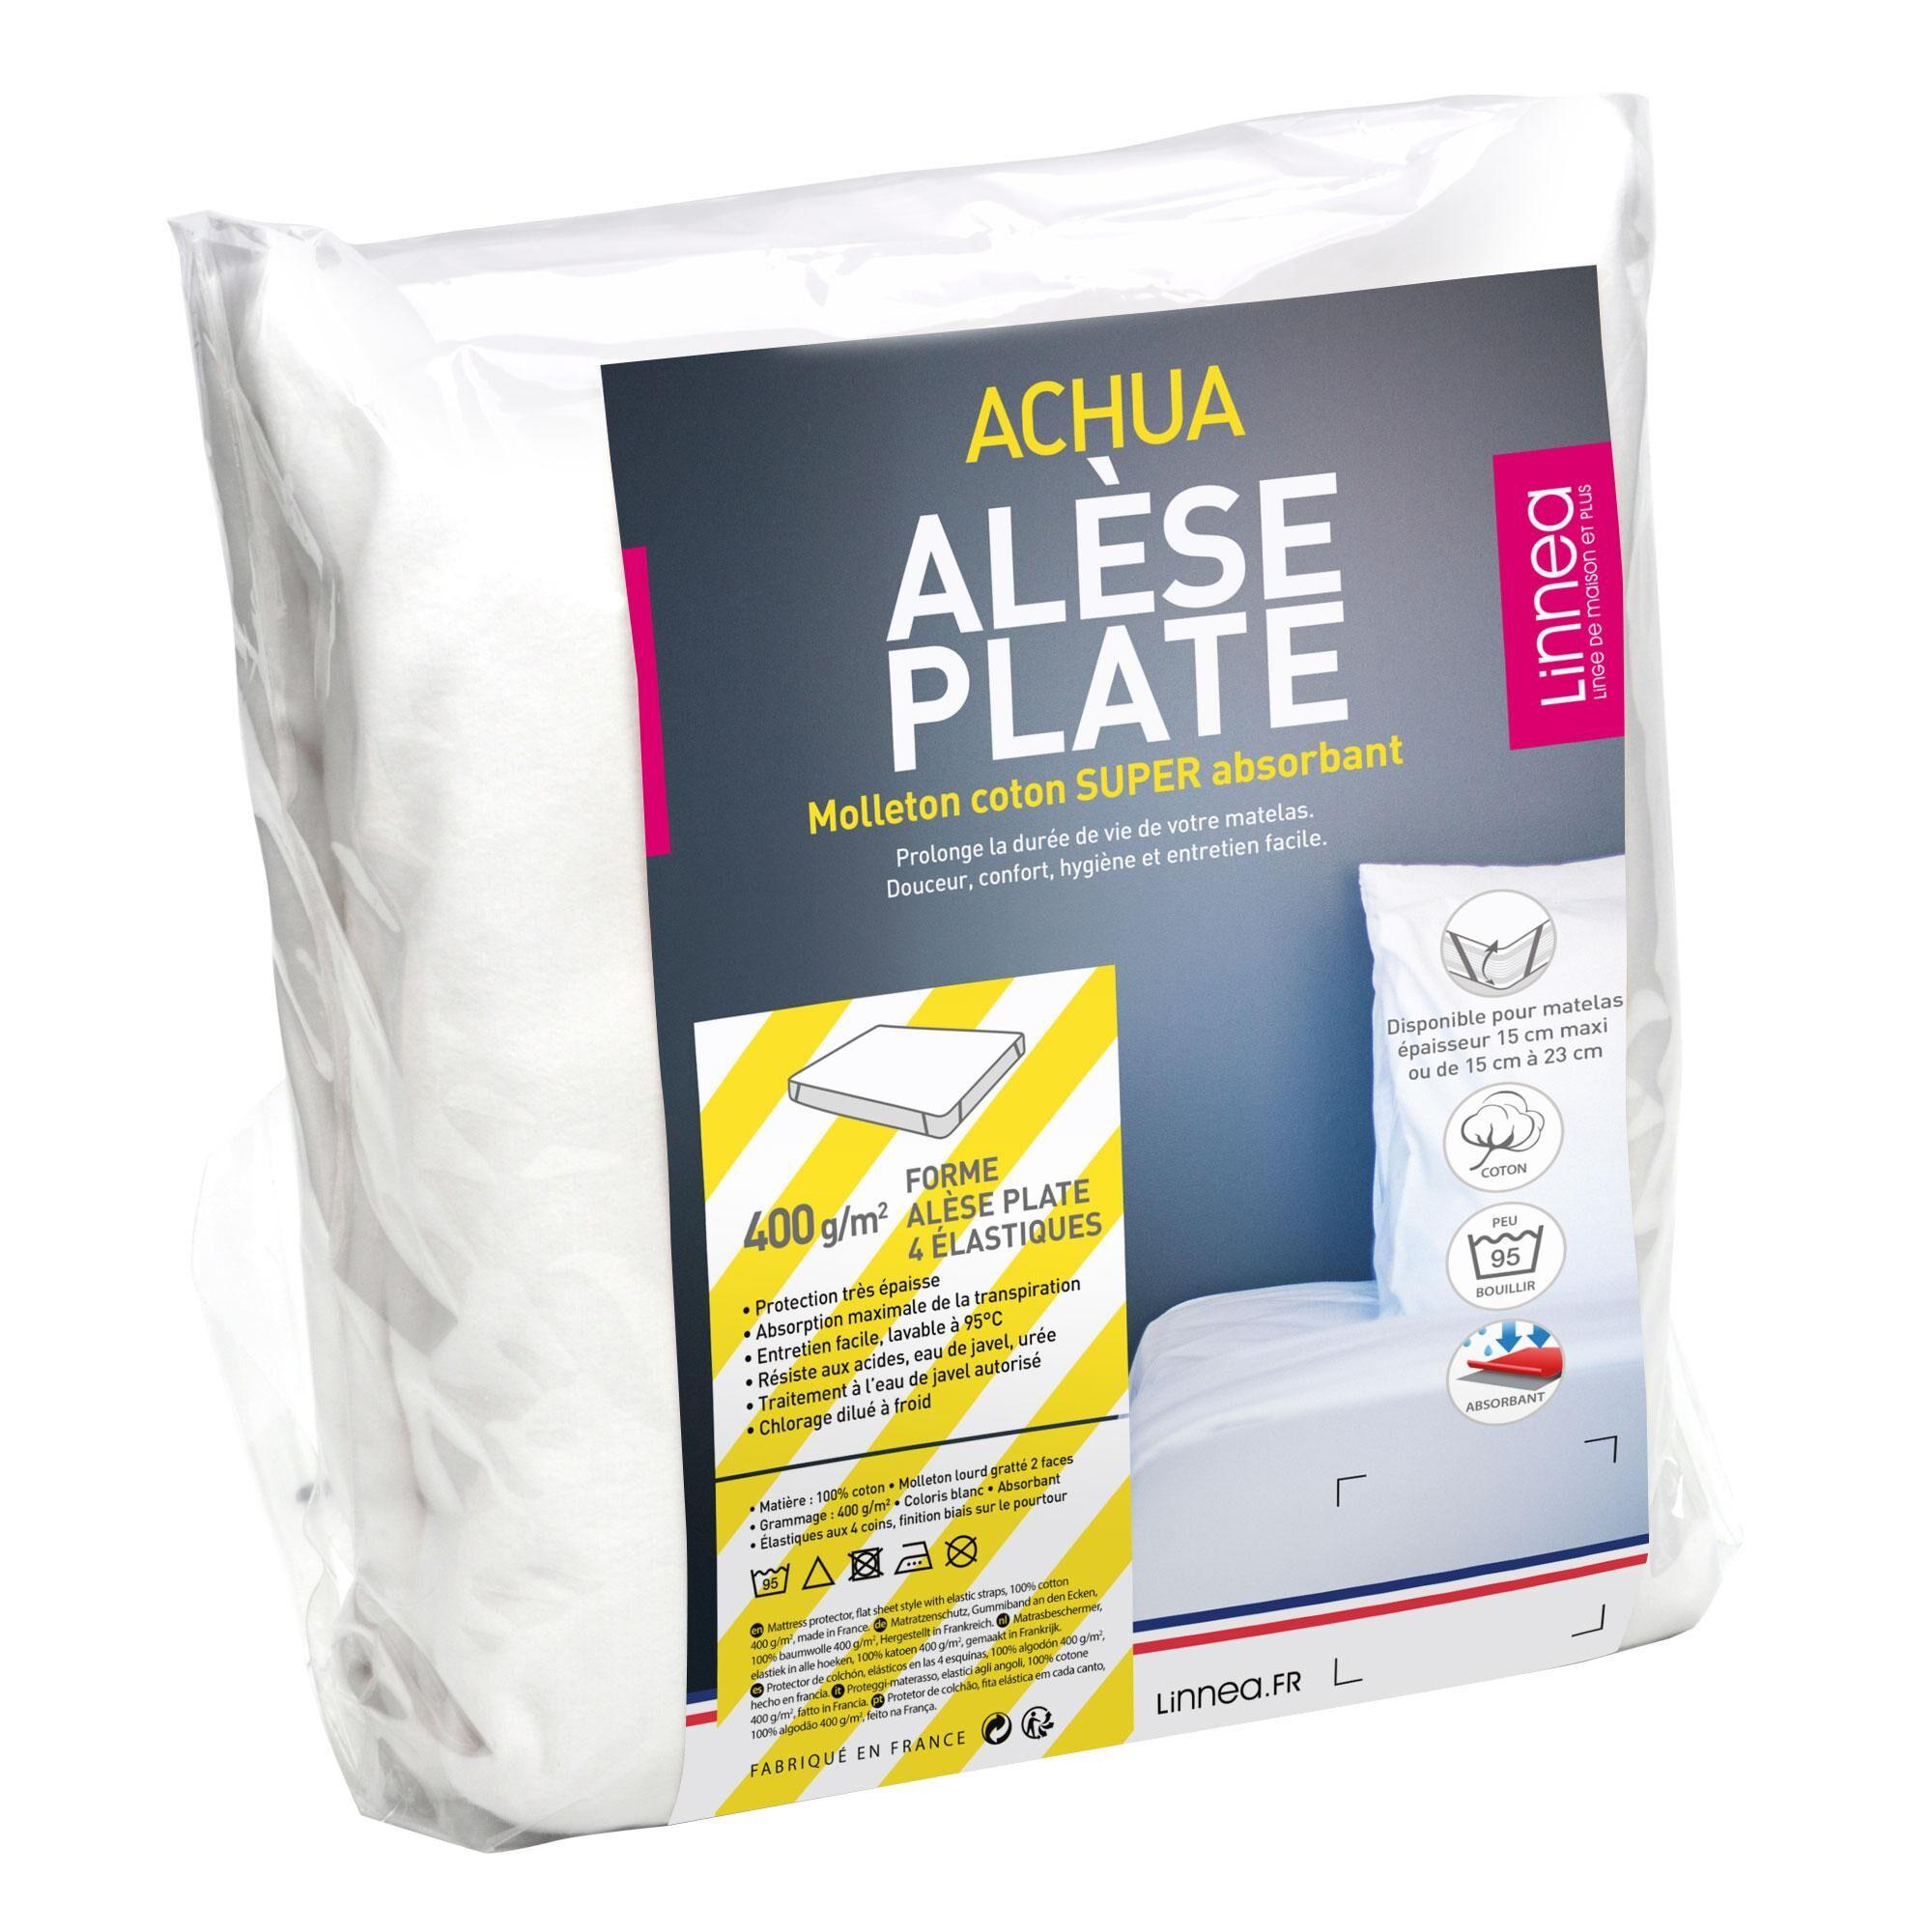 Linnea Alèse plate 60x120 cm ACHUA Molleton 100% coton 400 g/m2 matelas 15cm maxi